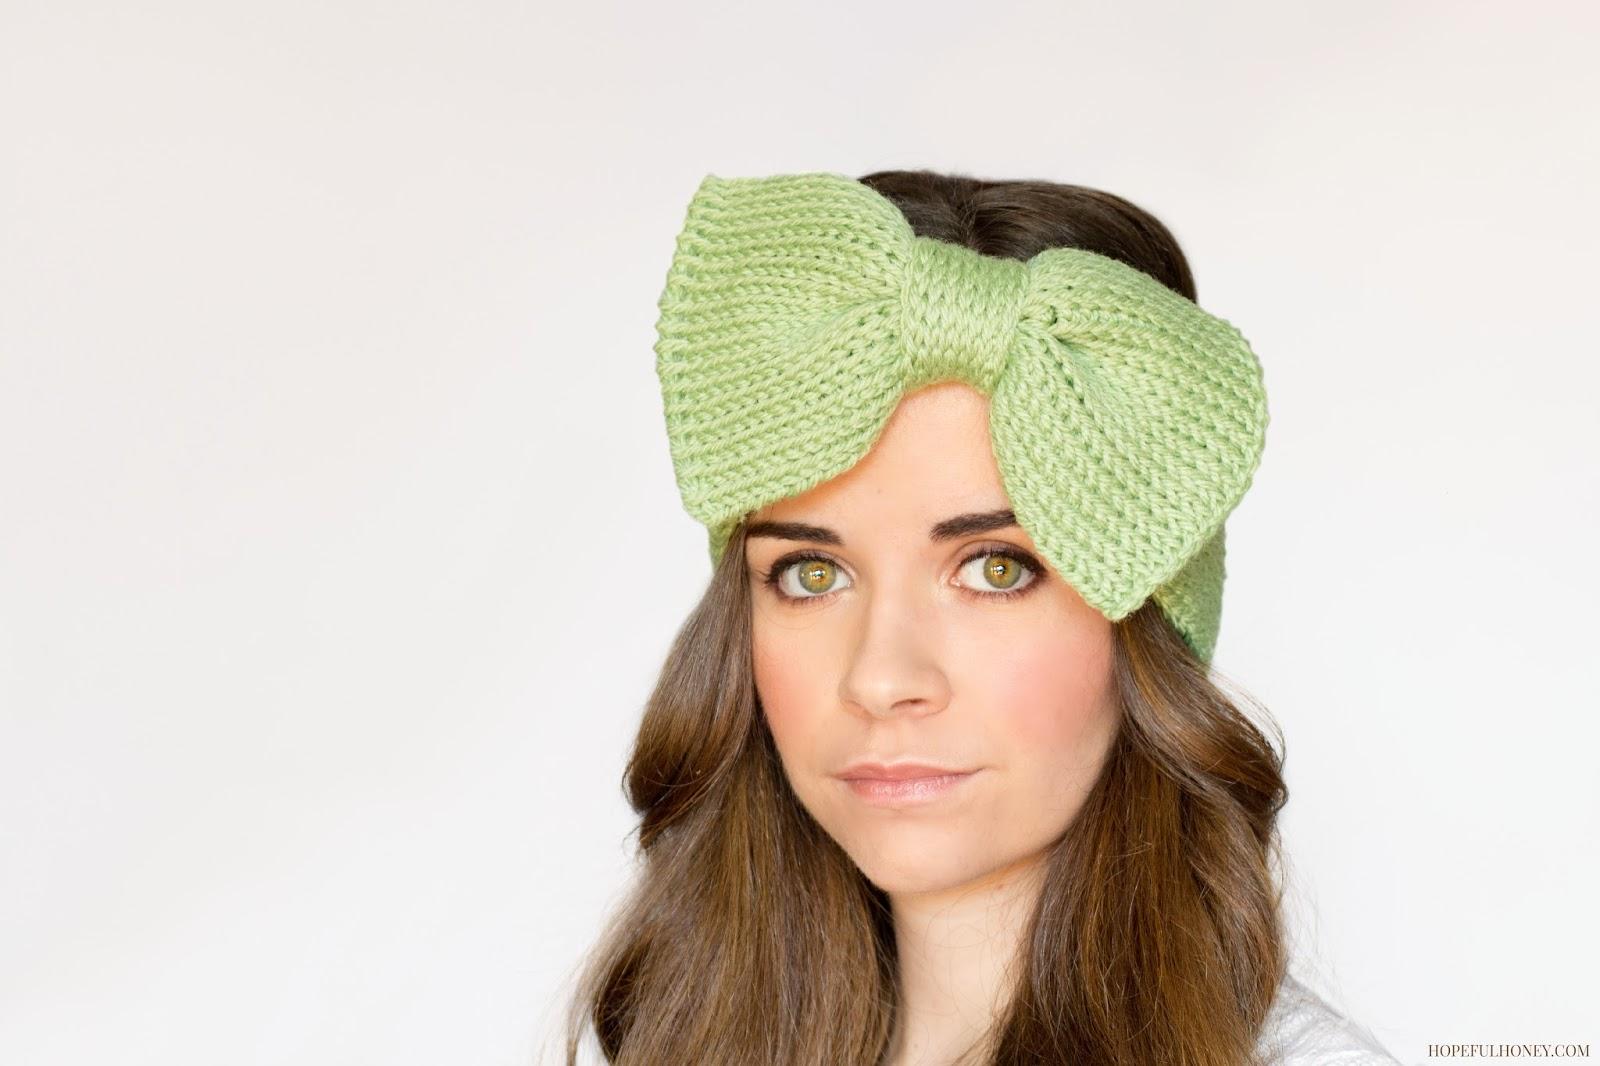 Hopeful Honey Craft, Crochet, Create: Sweetie Pie Bow ...